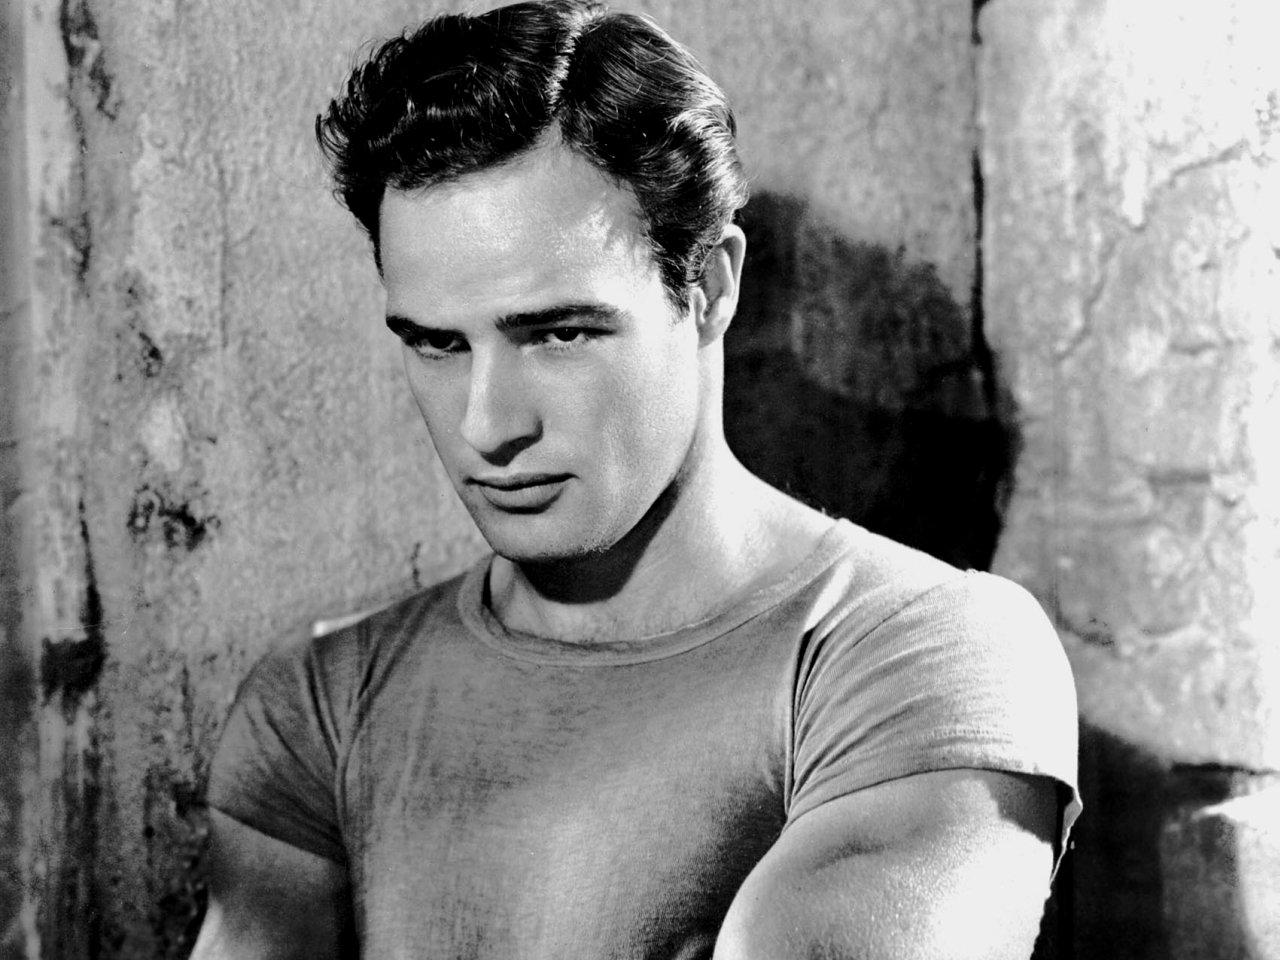 Marlon Brando, Actor. Omaha, NE.